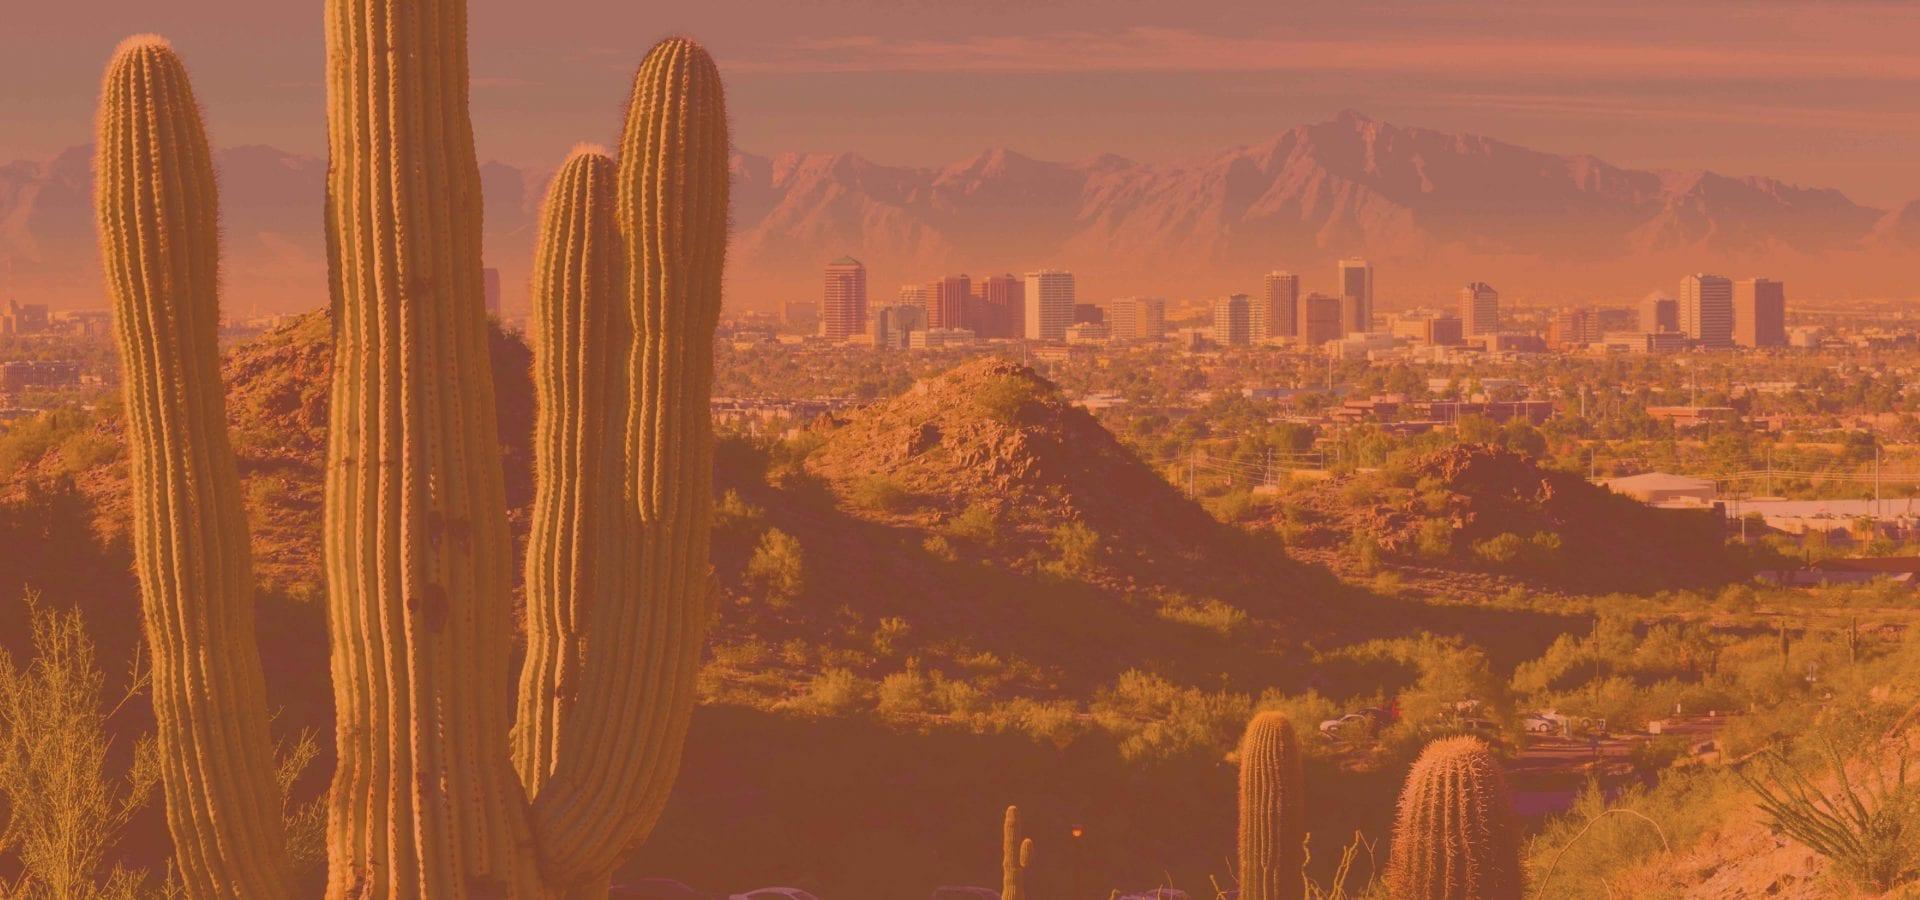 cactus with phoenix skyline in the background YMCA